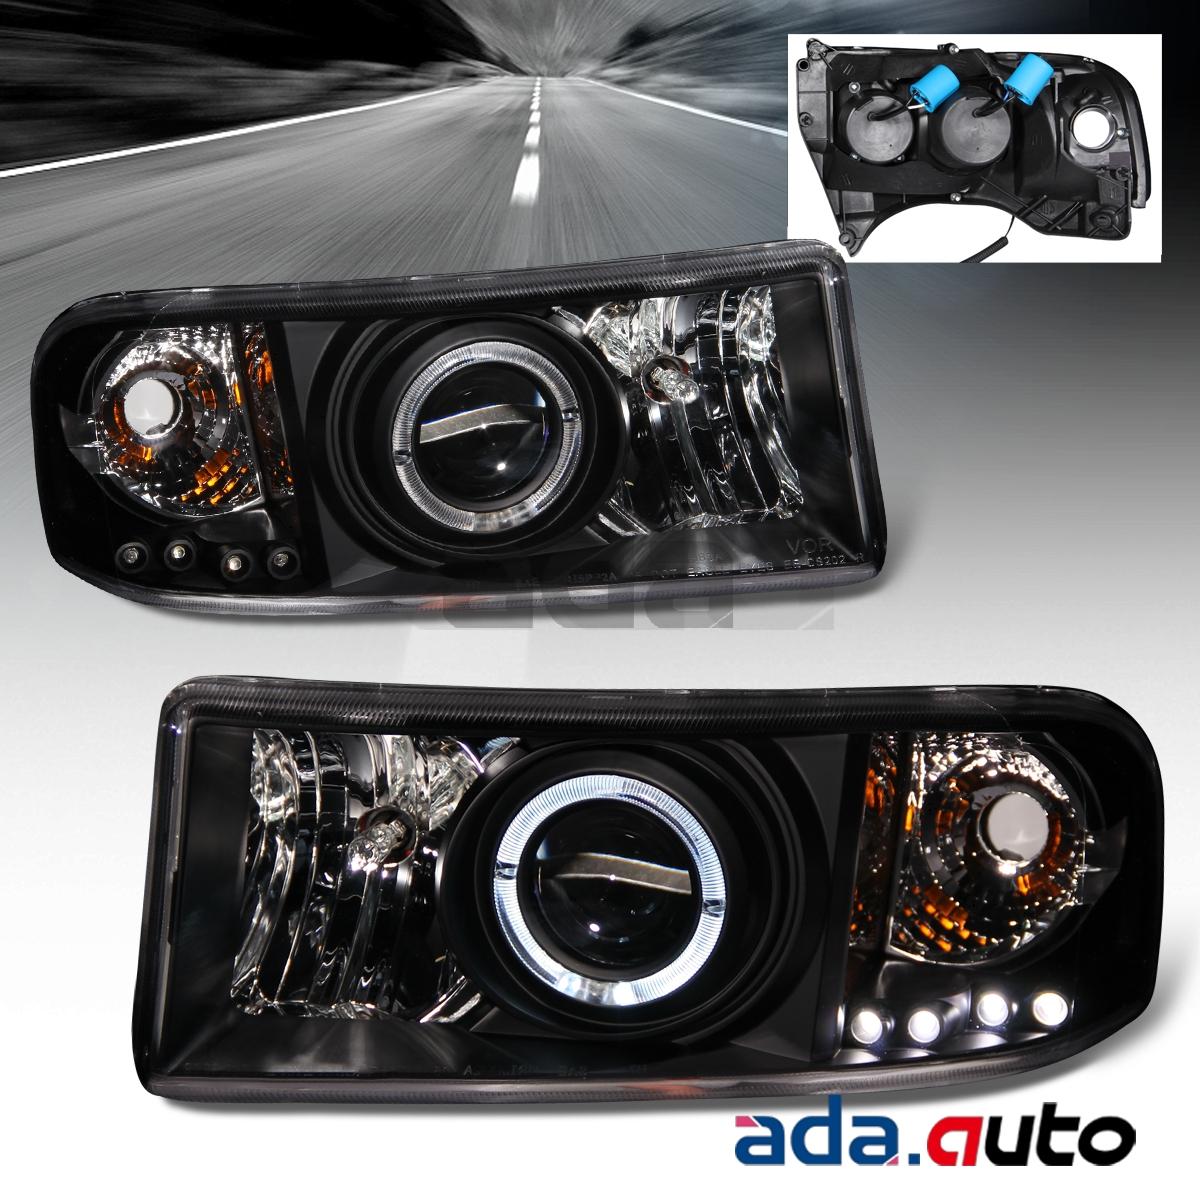 1998 dodge ram 1500 headlights ebay autos post 99 silverado wiring diagram cd player